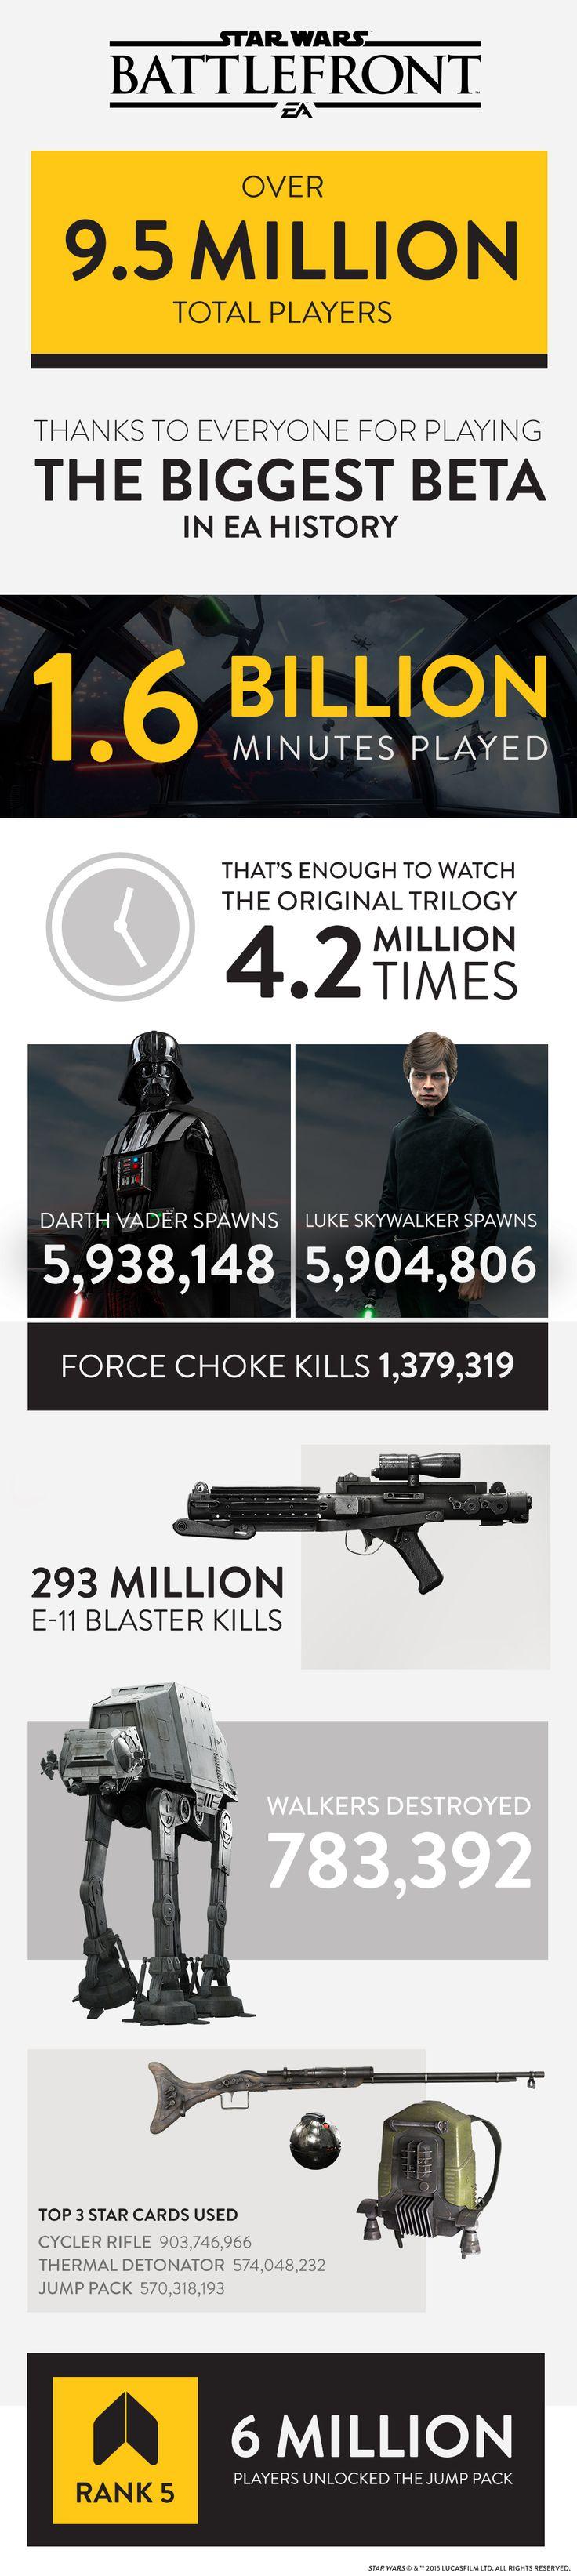 Star Wars Battlefront Beta (Video Game) Infographic